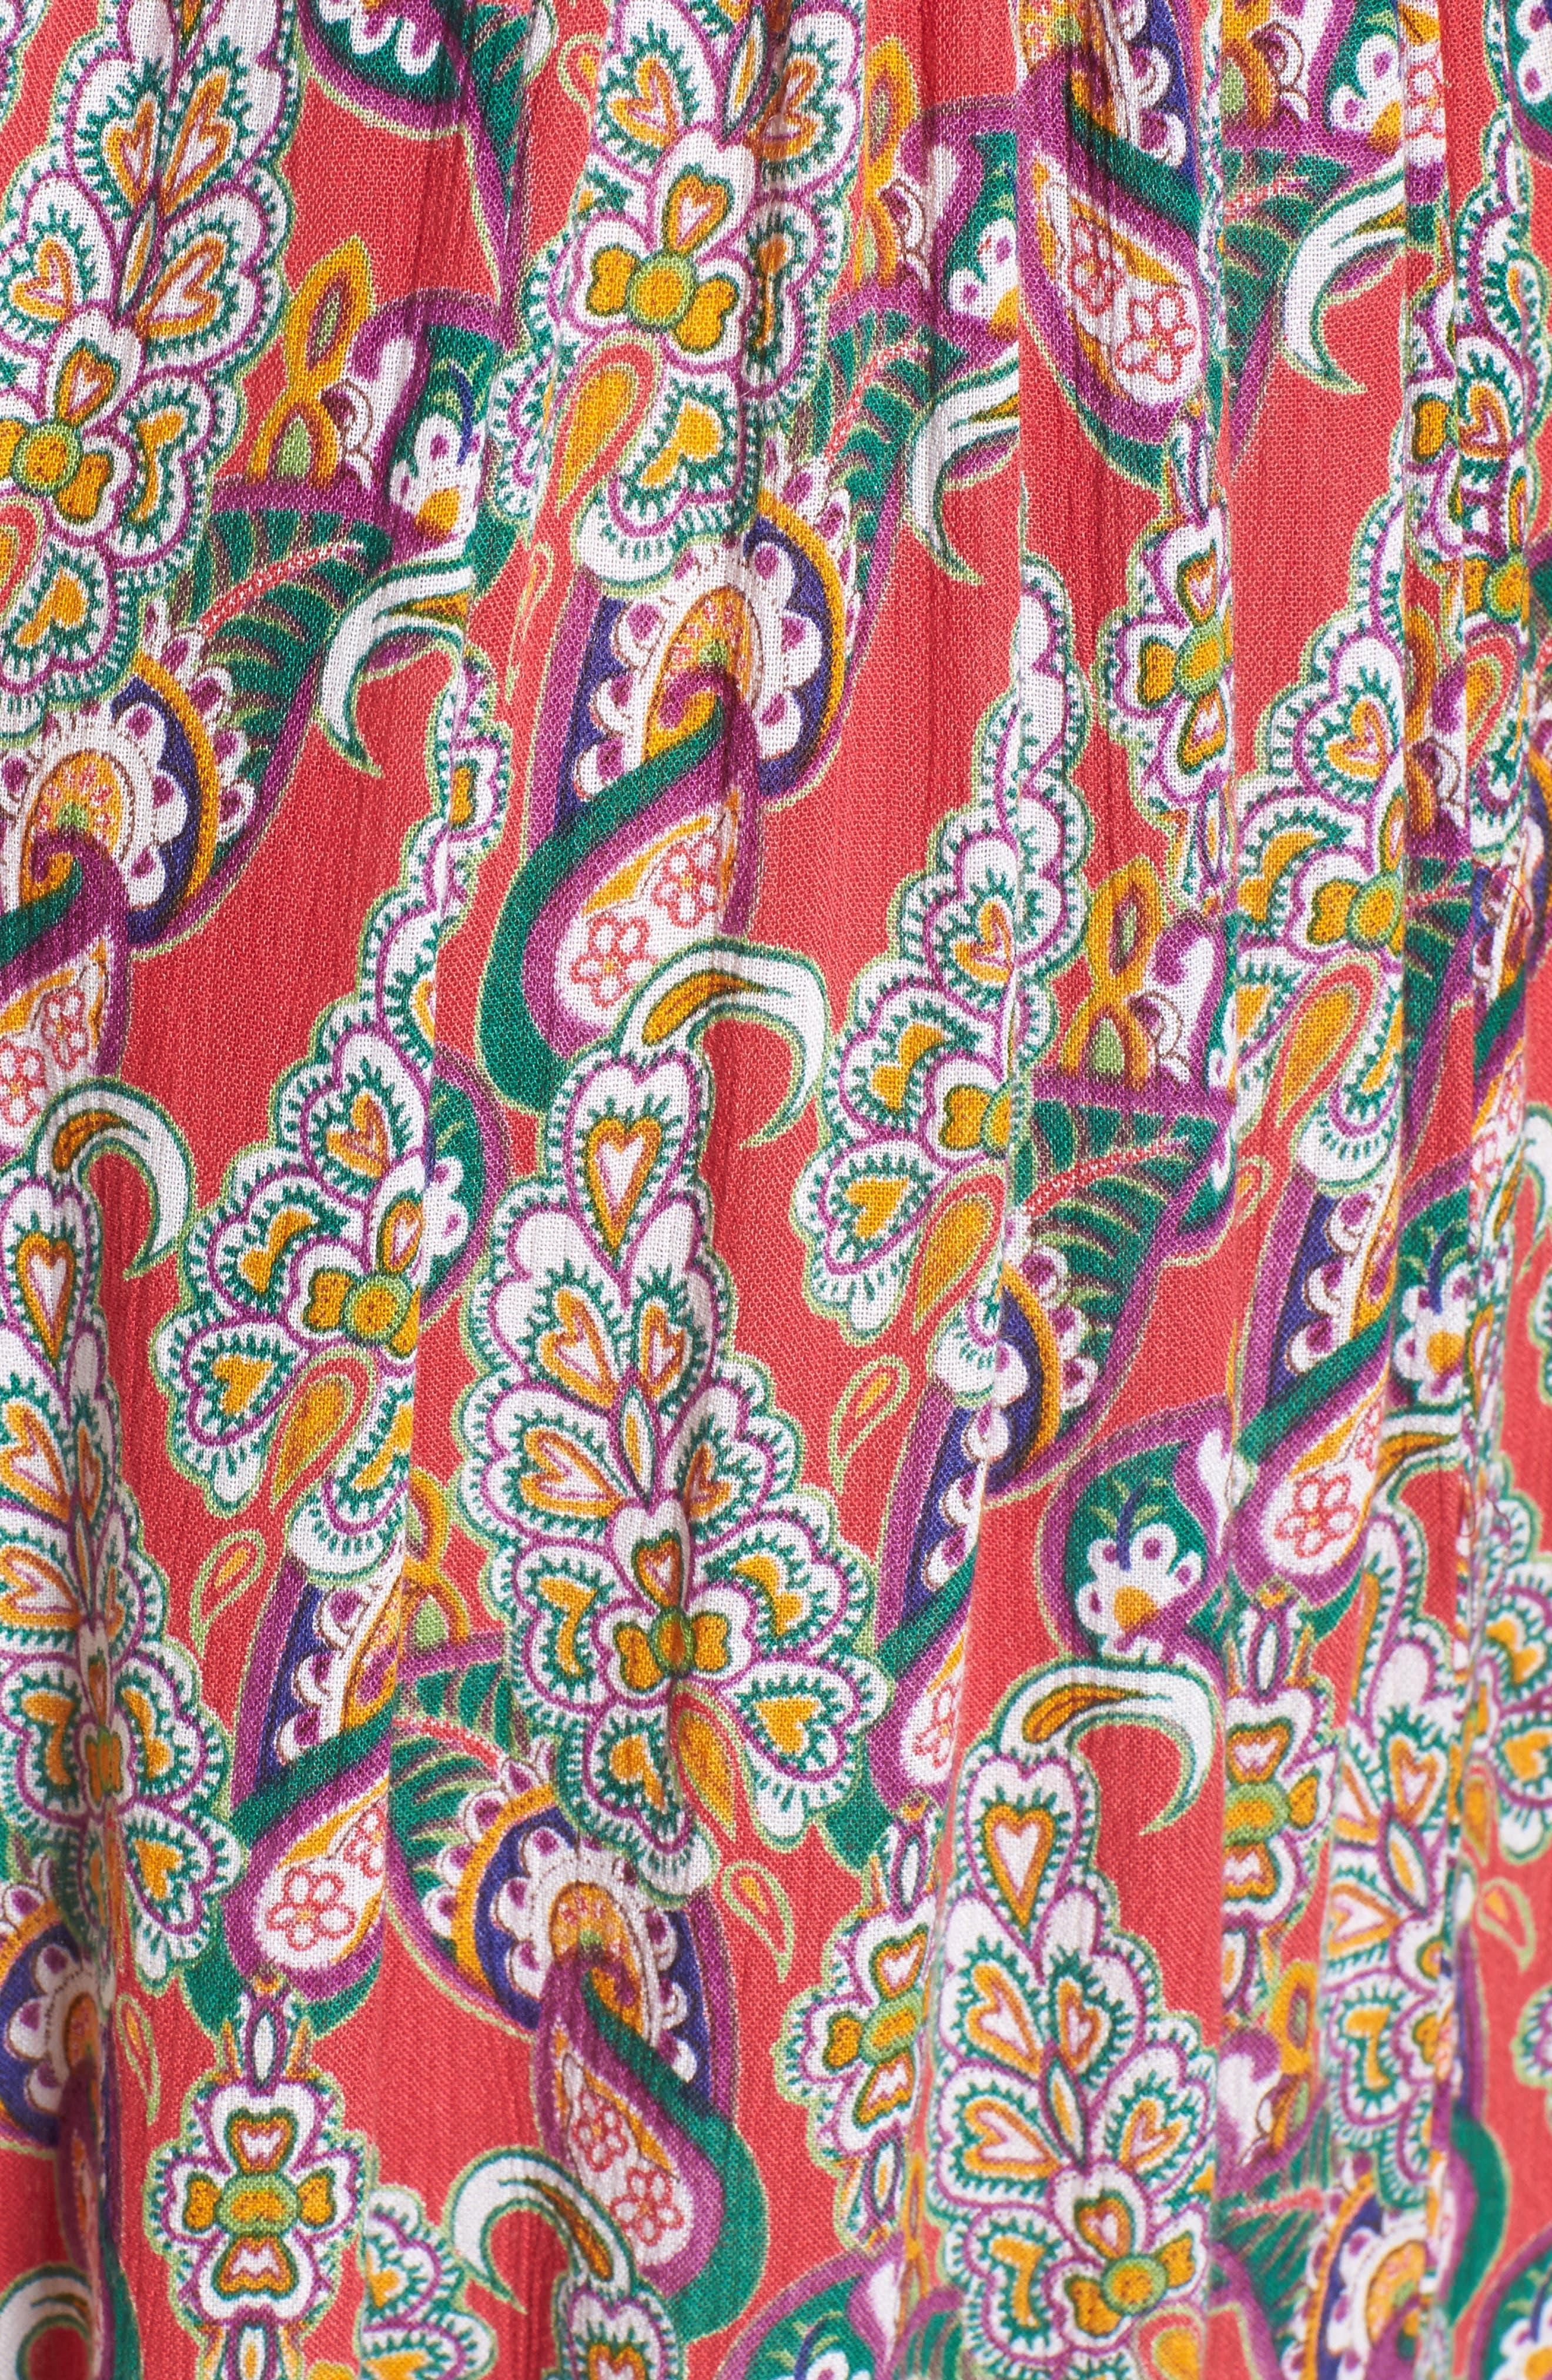 Alice Cut Out Back Midi Dress,                             Alternate thumbnail 5, color,                             645